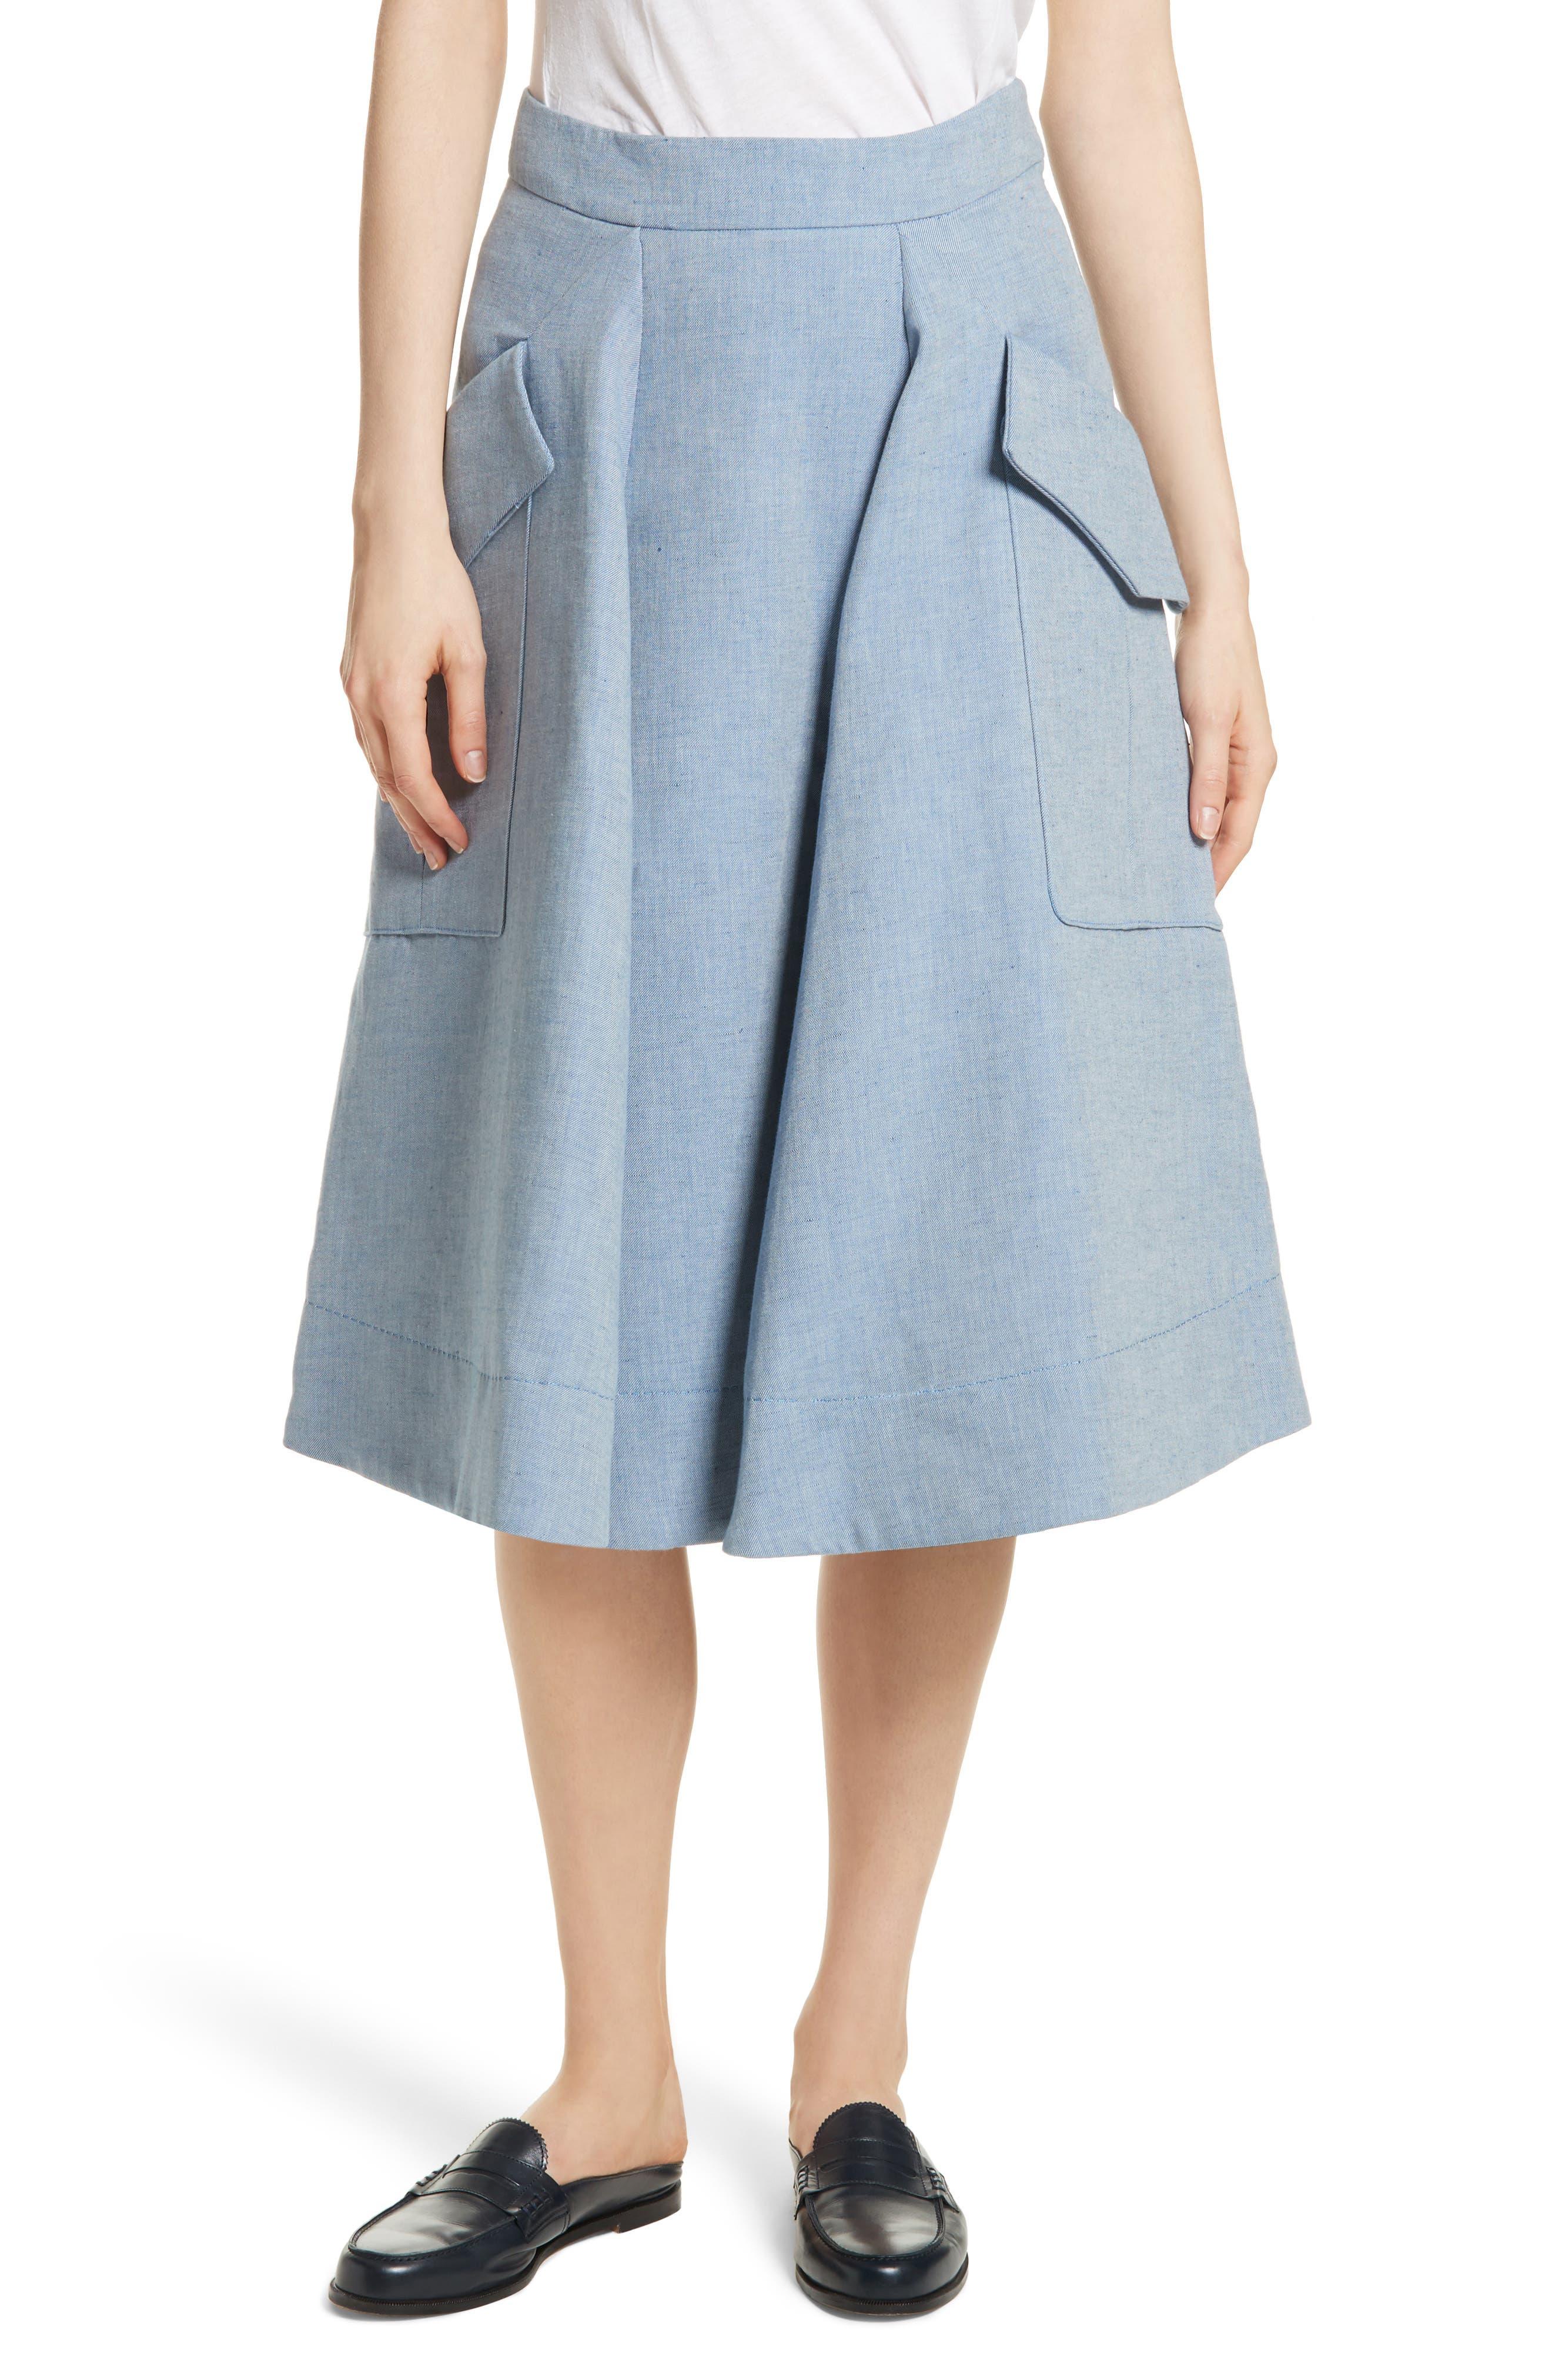 Main Image - Carven Jupe Genou Skirt